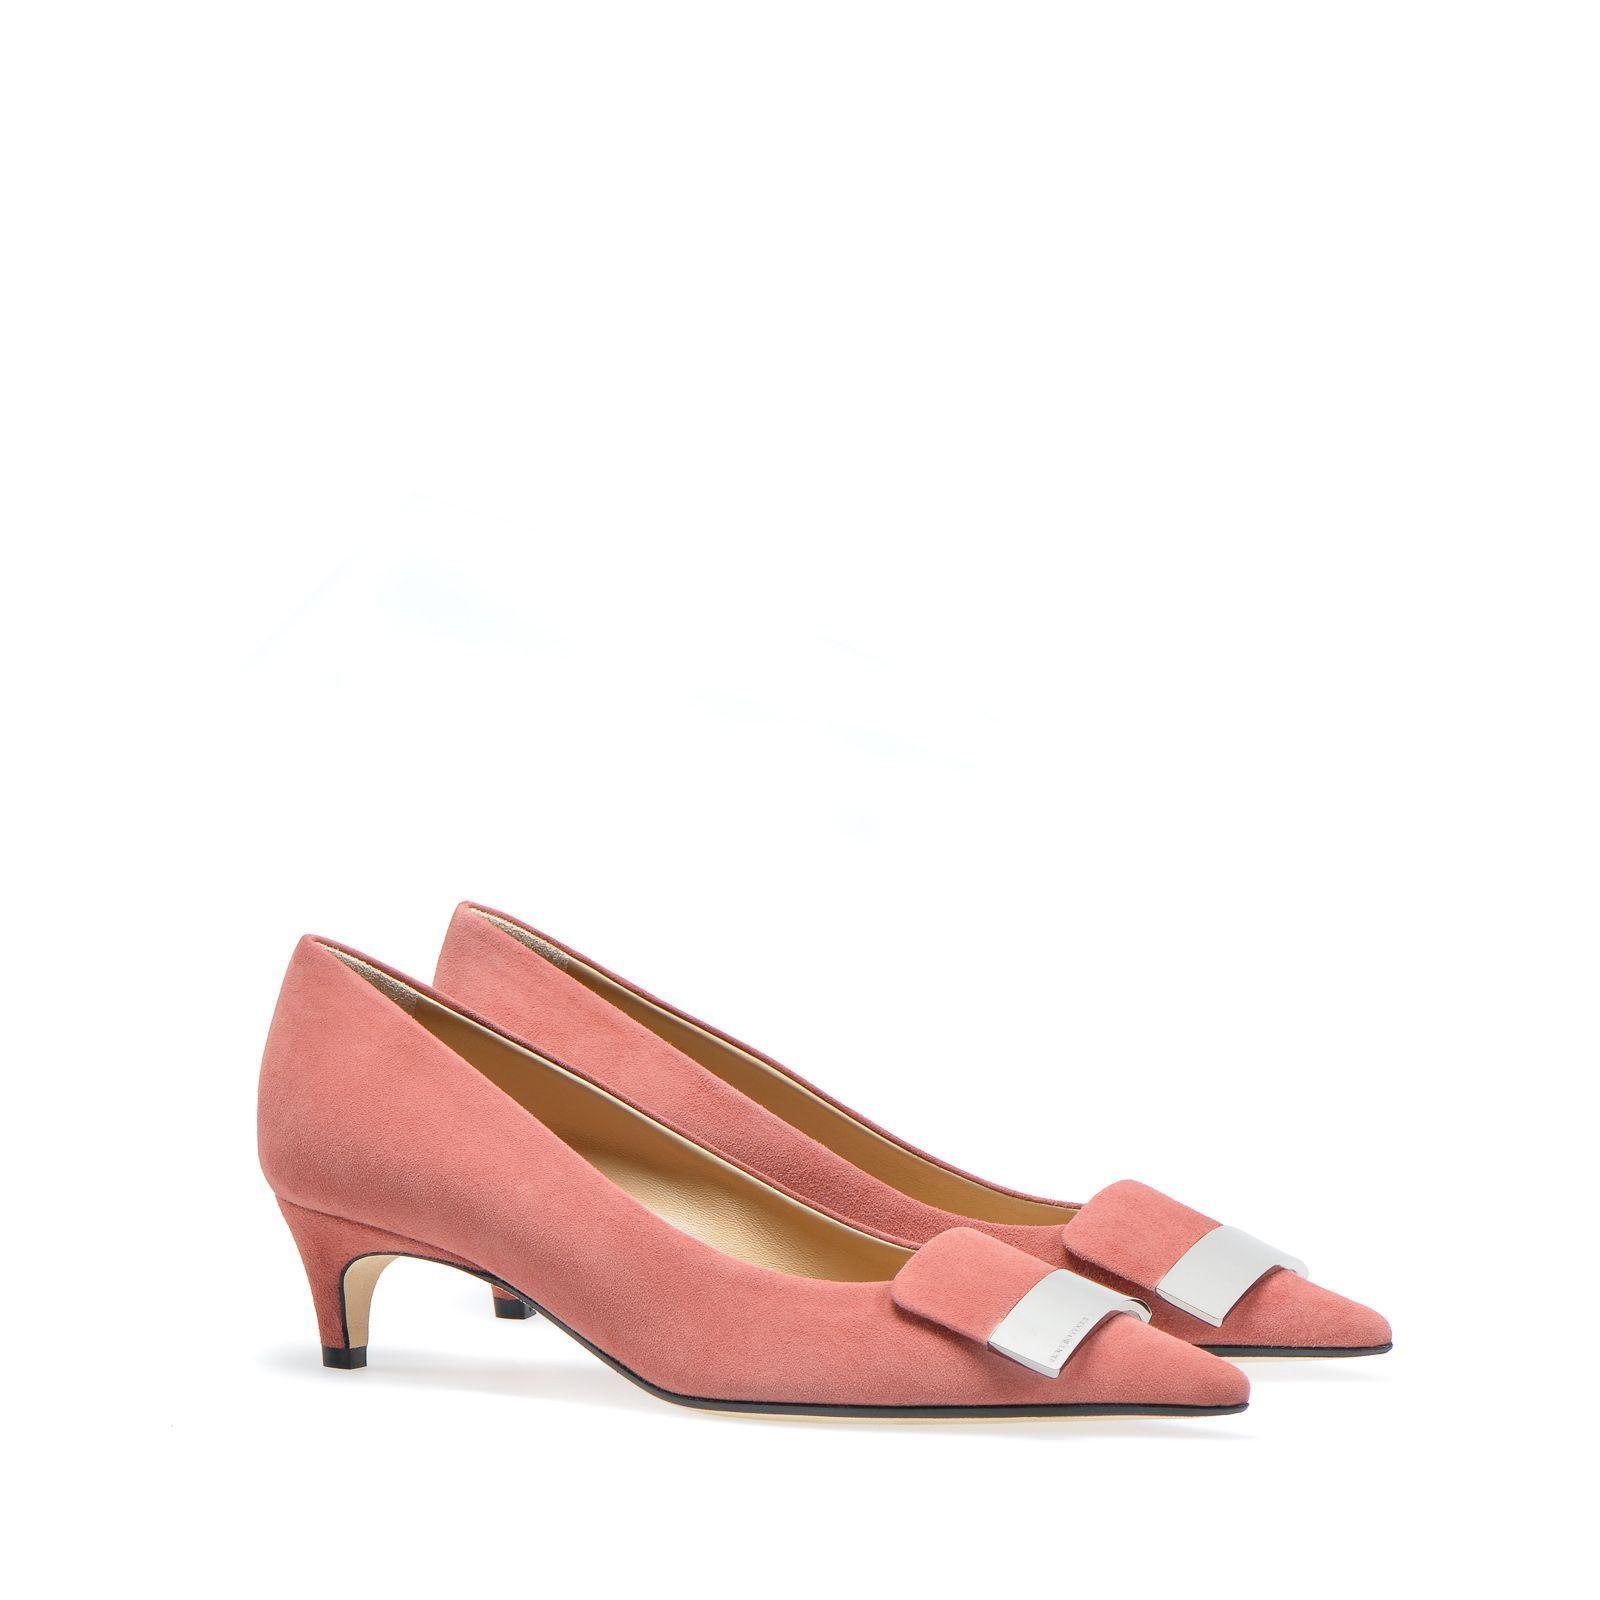 sergio rossi pink pumps